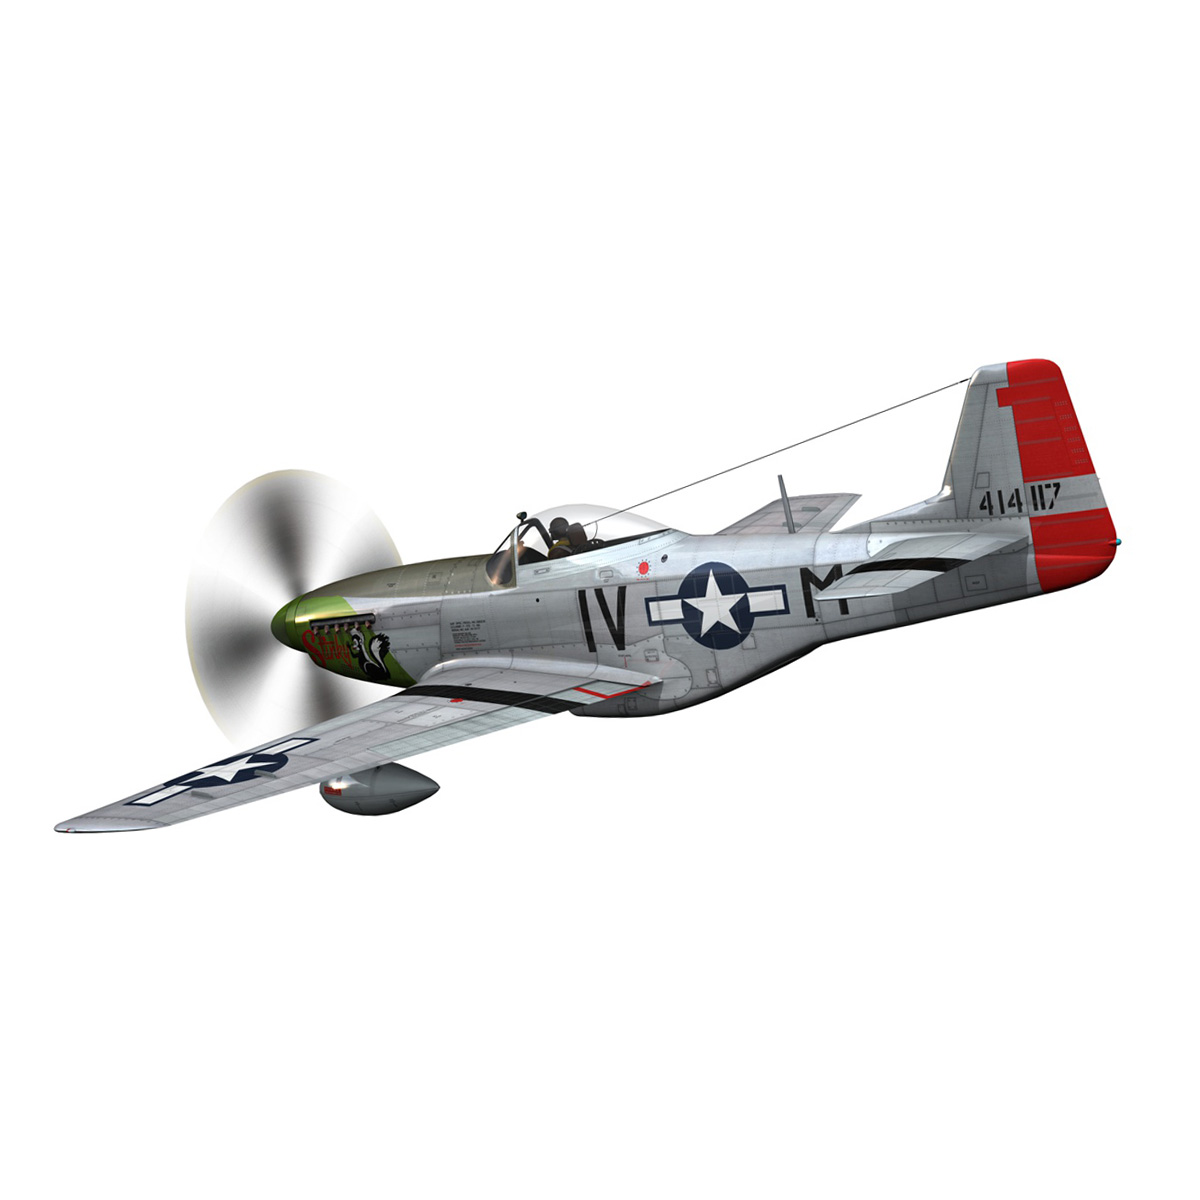 north american p-51d mustang – stinky 3d model fbx c4d lwo obj 269599